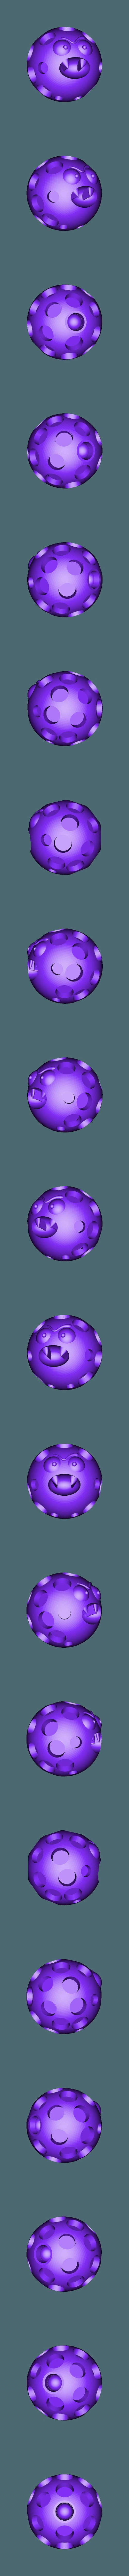 Coronaboule.stl Download free STL file CoviDisNeuf • 3D printing design, Luckyco